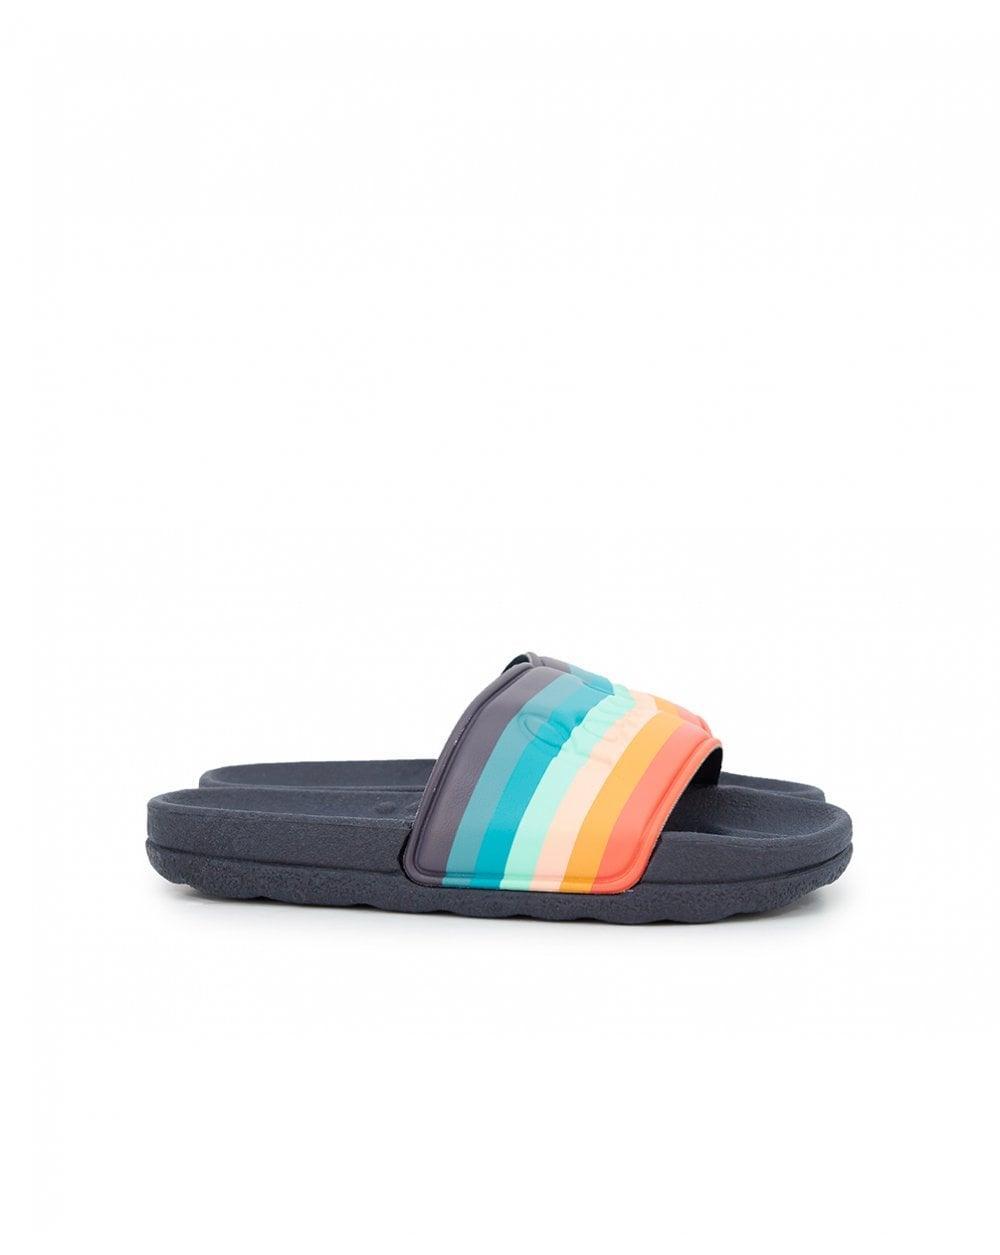 2eac46321 Paul Smith Takak Multi Stripe Logo Sliders in Blue for Men - Lyst